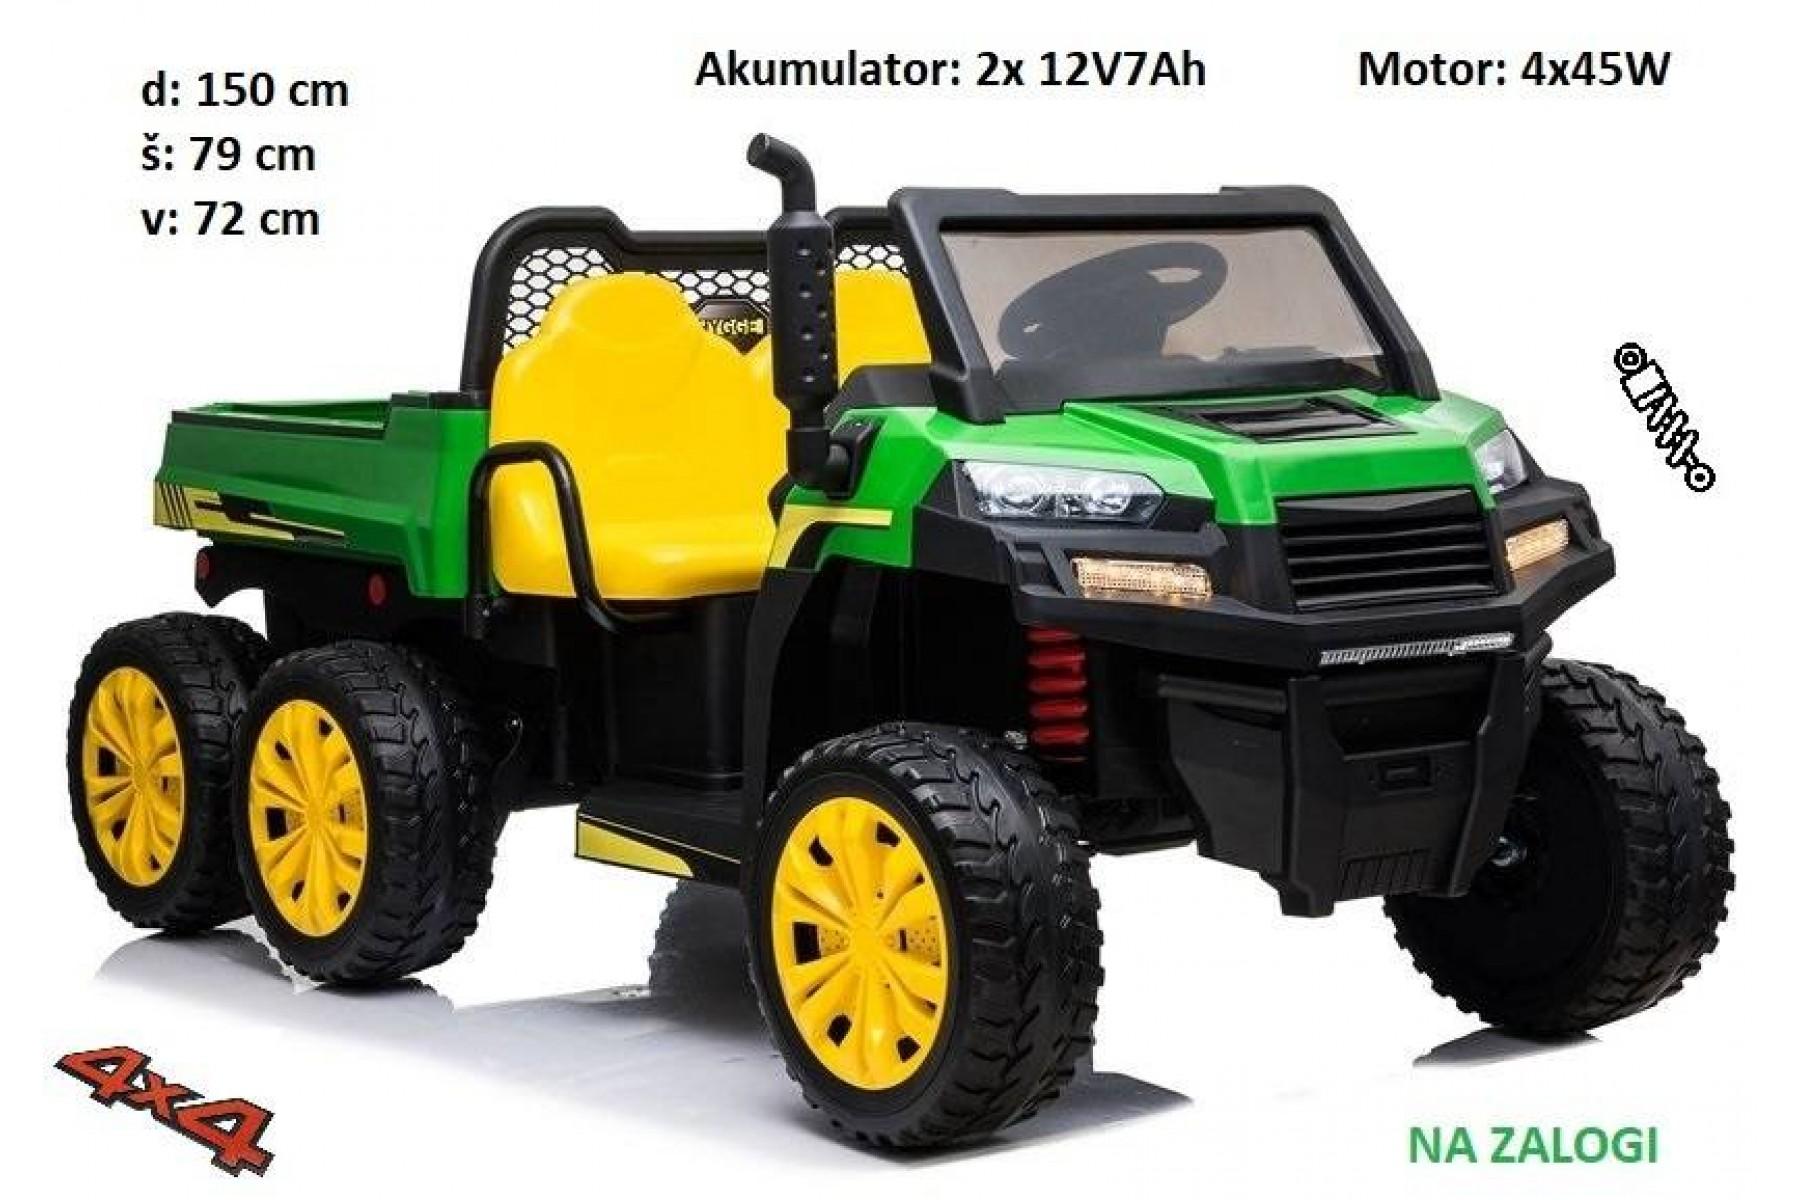 Otroški traktor Farmer 4x4